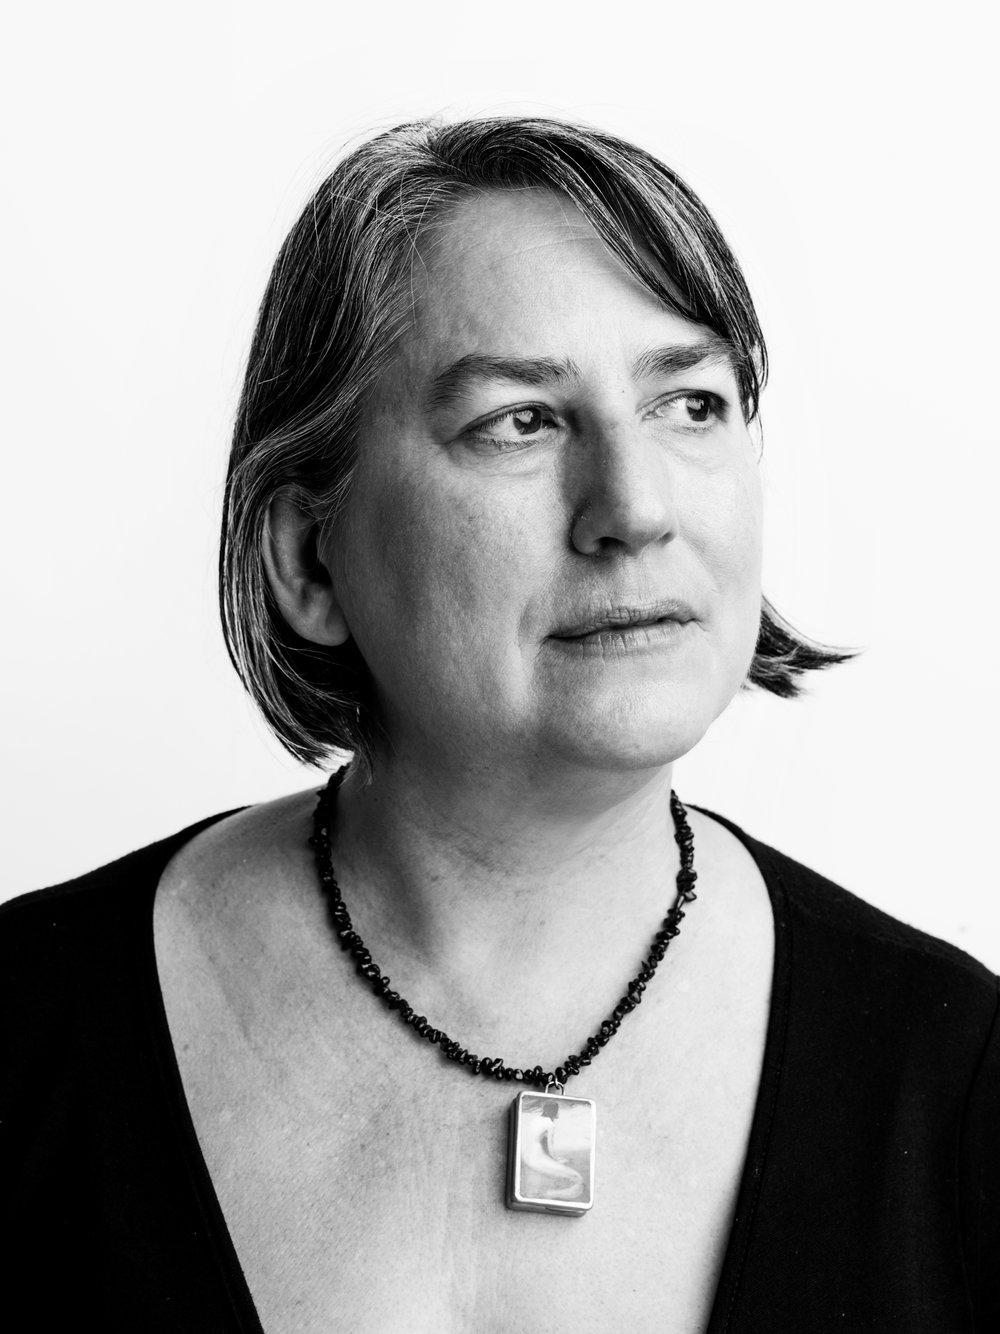 LESLIE EBEL | ART DIRECTOR, 1993-1995